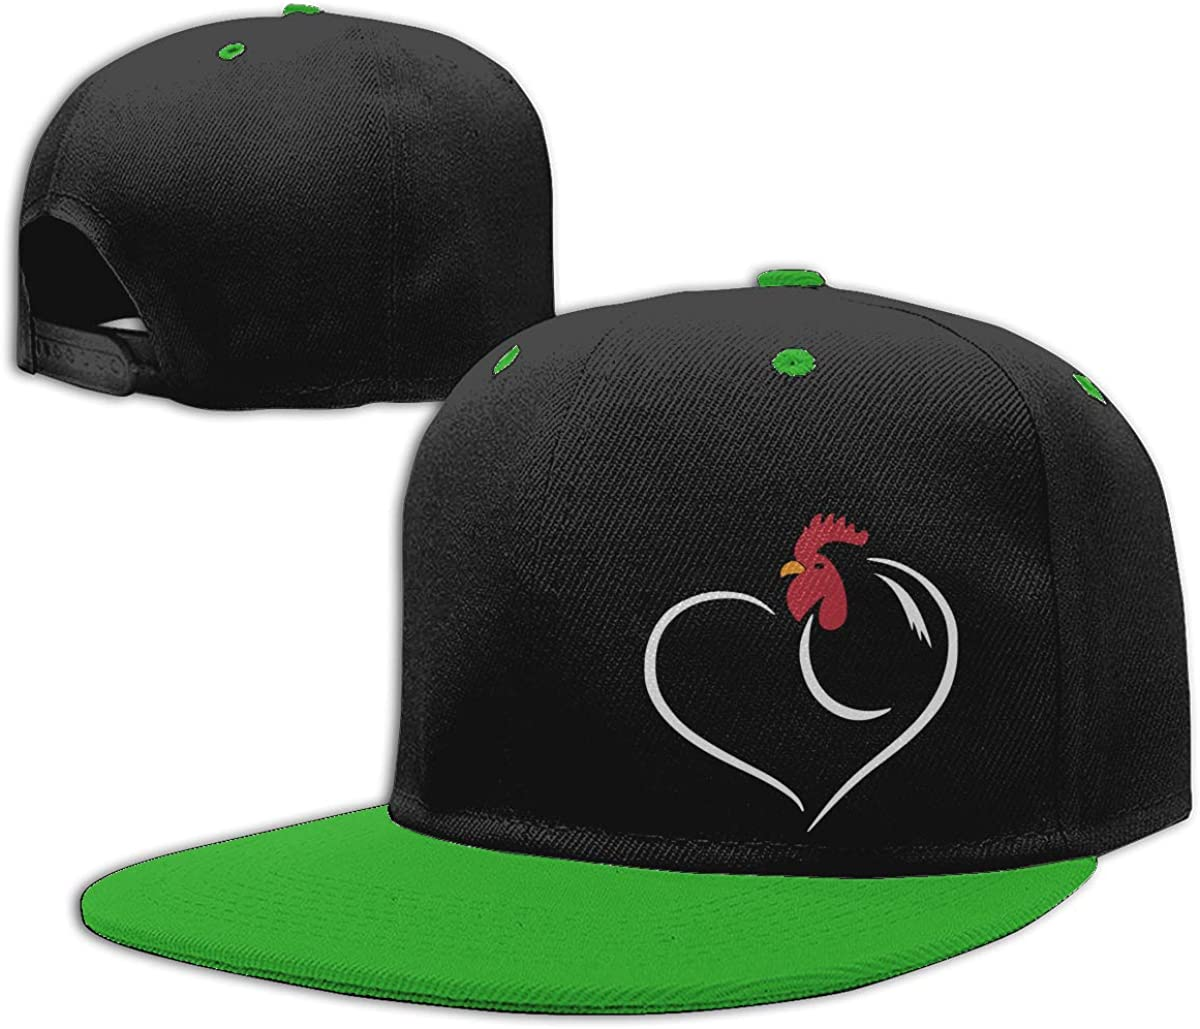 Chickens Heart Unisex Flat Brim Baseball Caps NMG-01 Women Men Trucker Cap